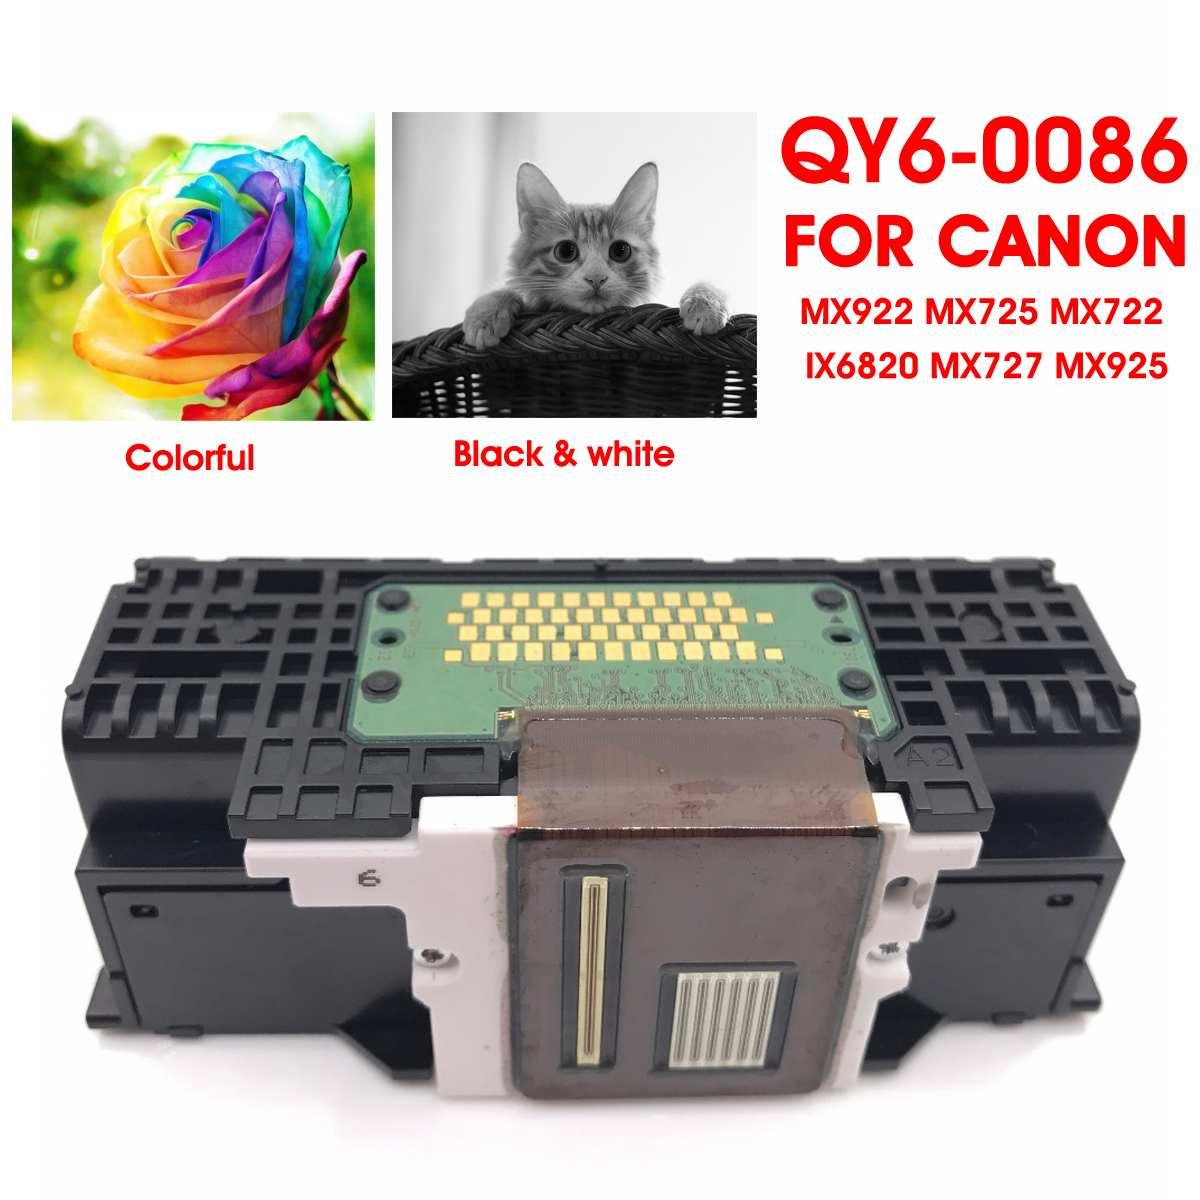 LEORY QY6-0086 cabezal impresora cabeza de impresión Printerhead piezas de la impresora Canon MX922 MX725 MX722 IX6820 MX727 MX925